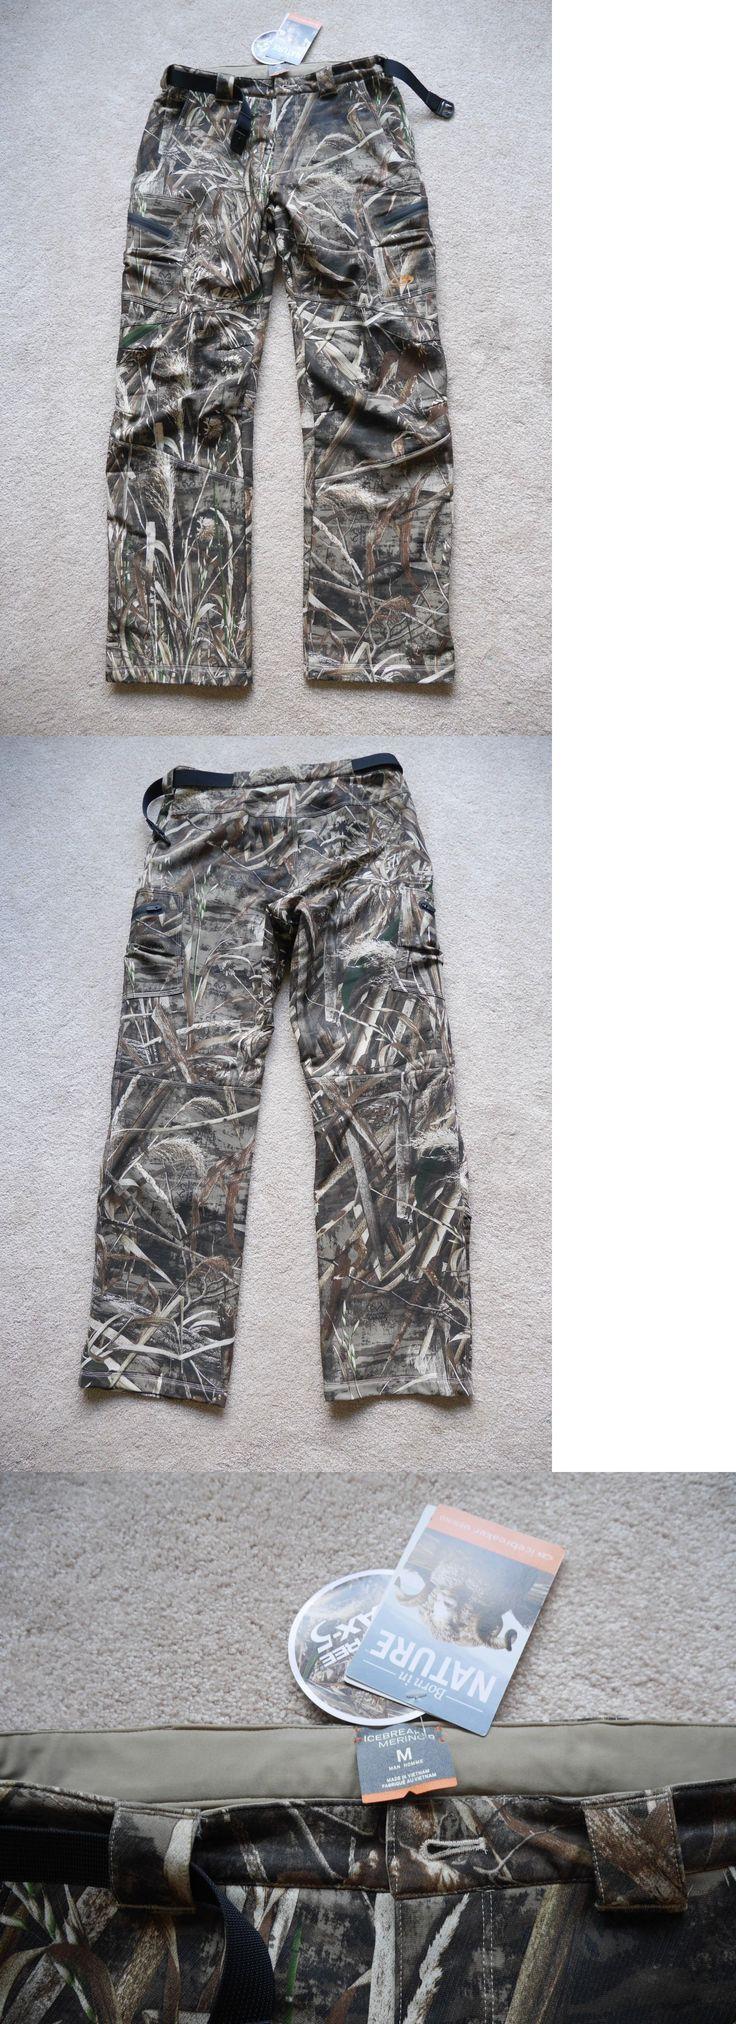 Base Layers 177867: Icebreaker Ika Merino Wool Hunting Pants, Men S M Realtree Max 5 -> BUY IT NOW ONLY: $100 on eBay!